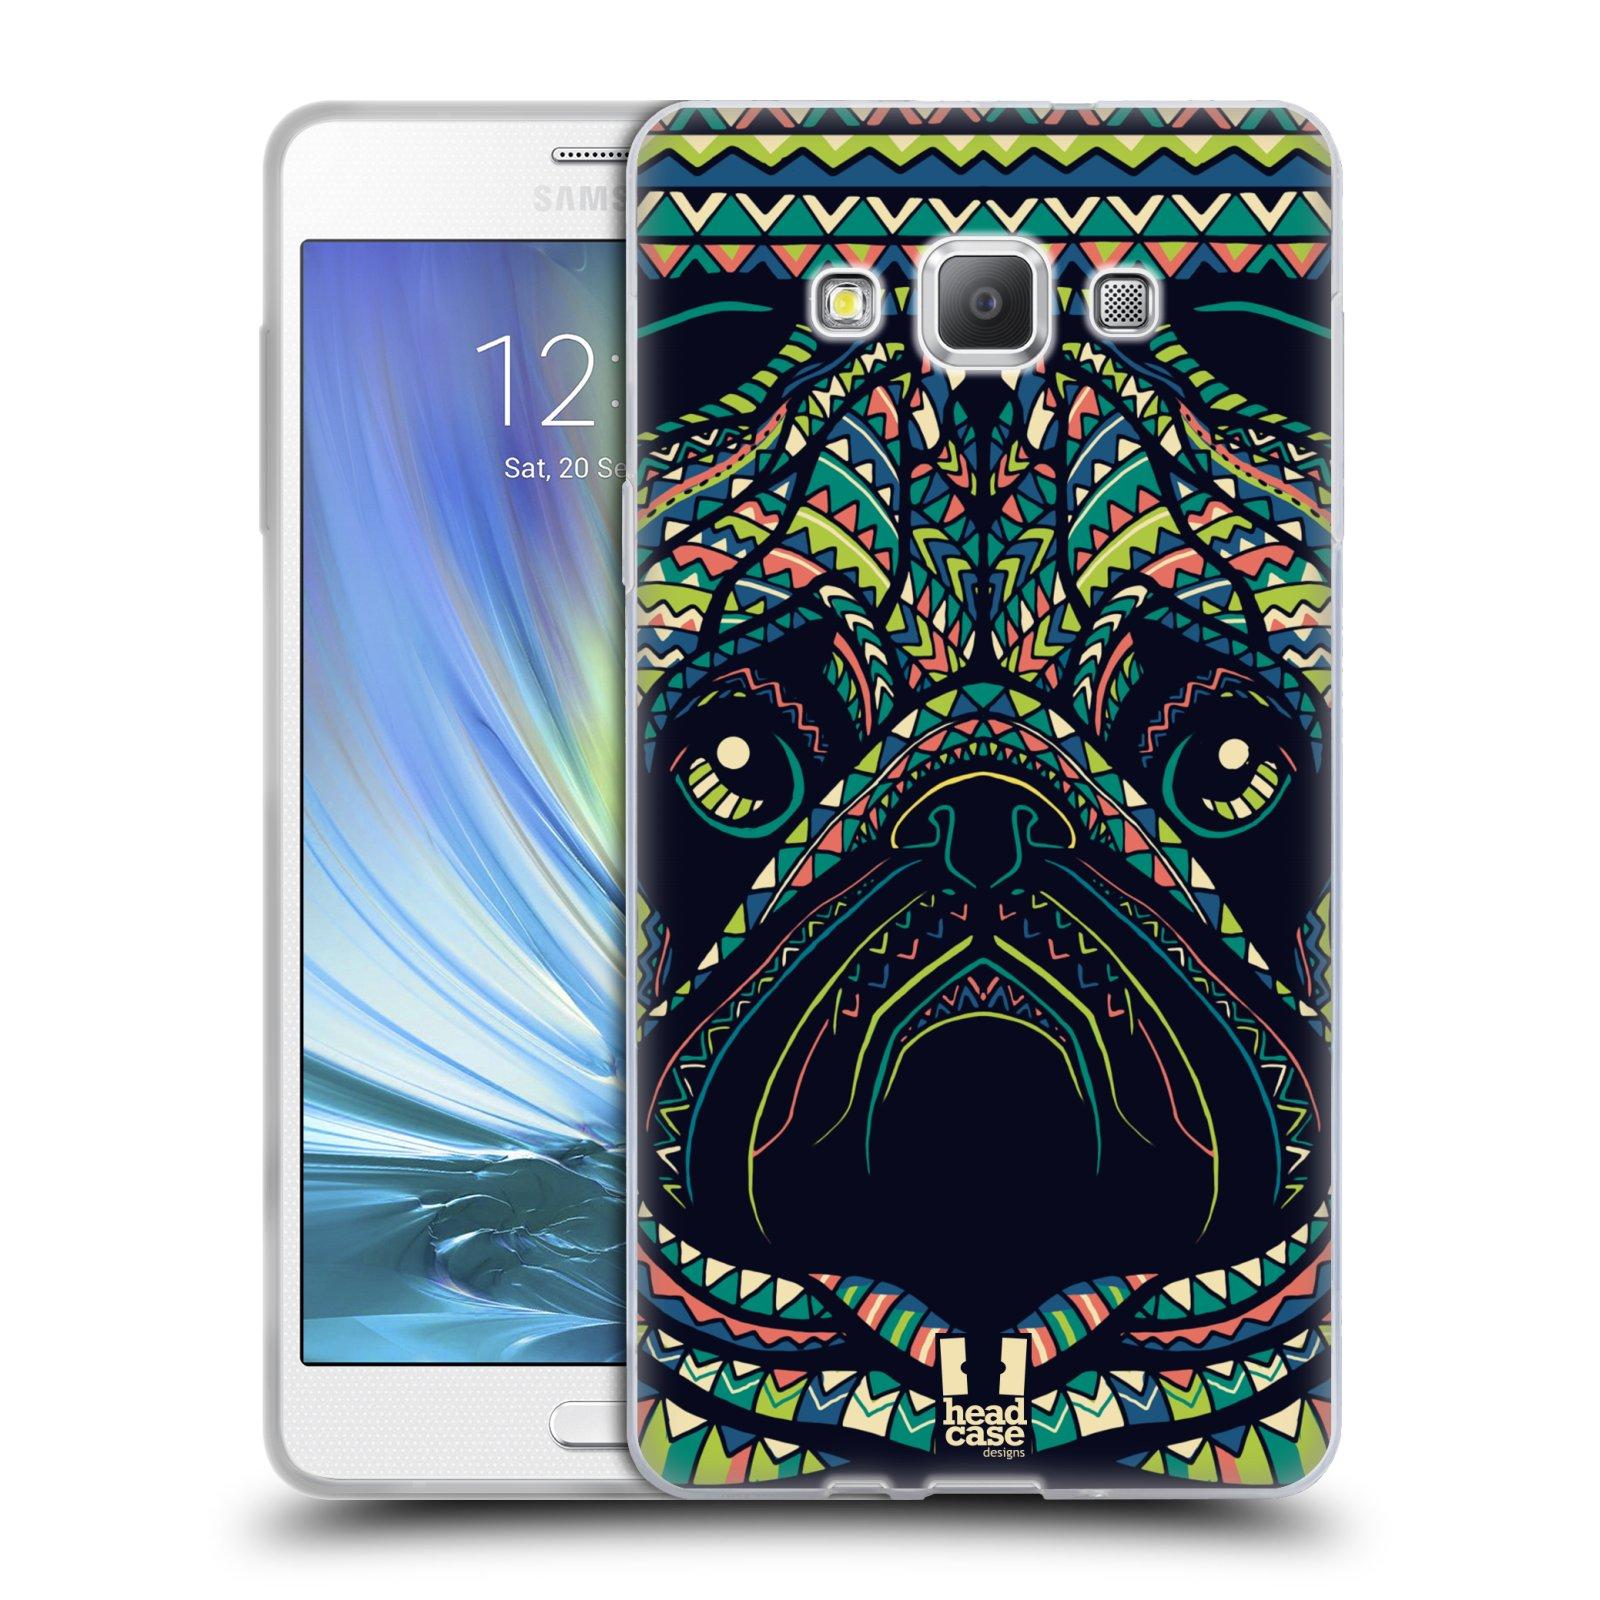 HEAD CASE silikonový obal na mobil Samsung Galaxy A7 vzor Aztécký motiv zvíře 3 mopsík